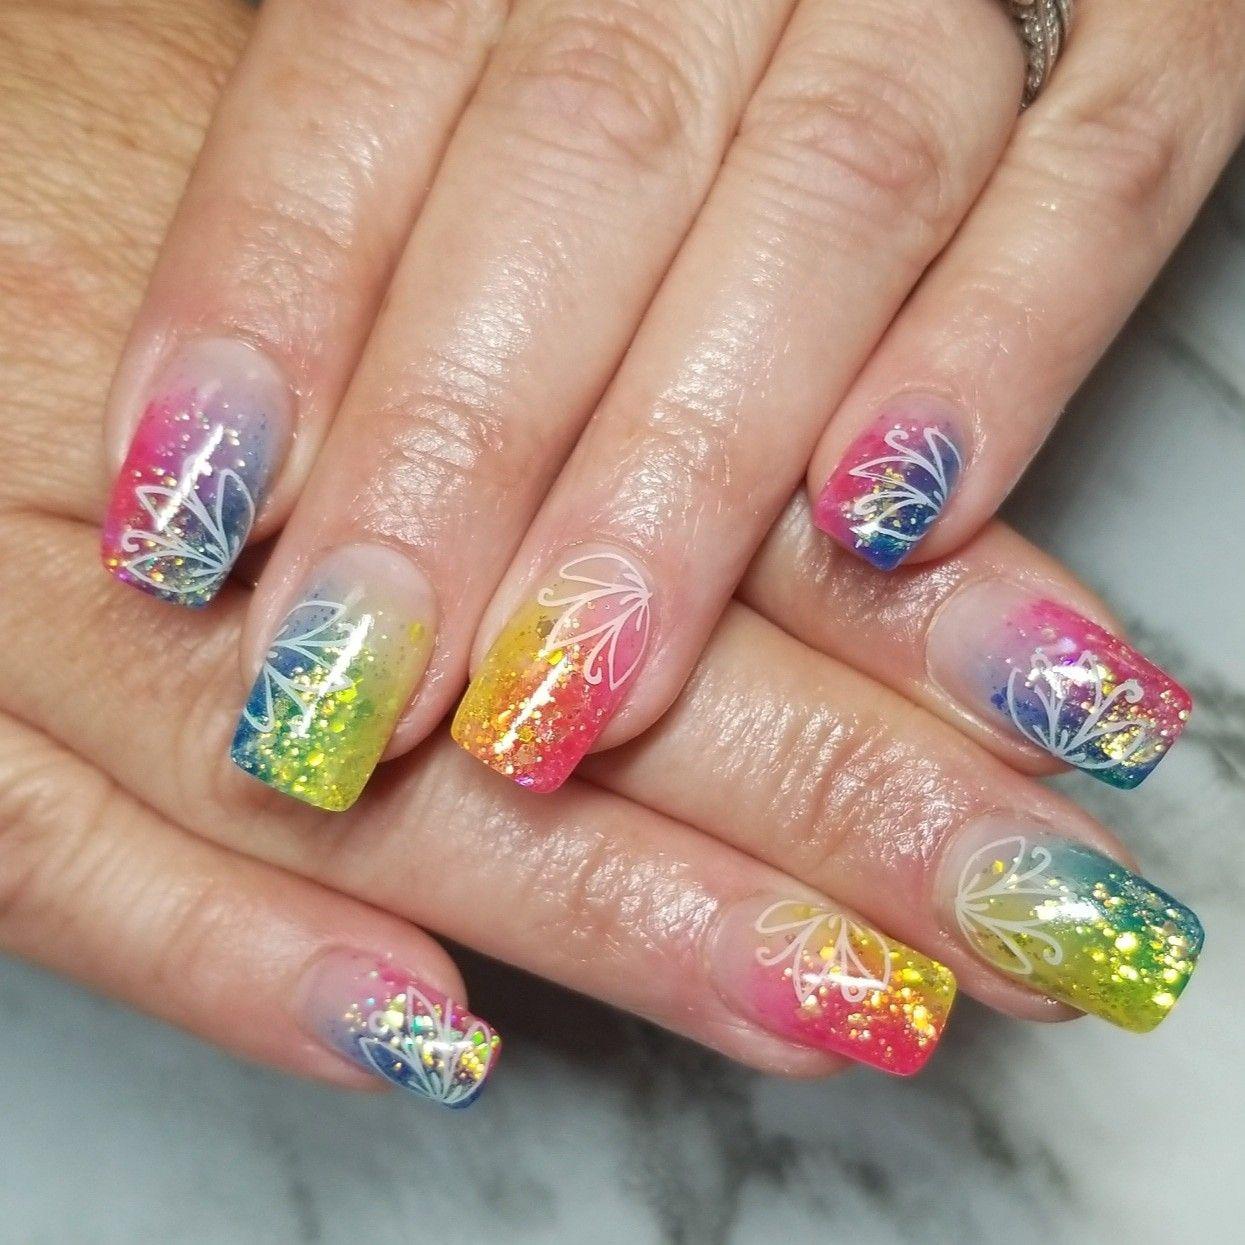 Pin by sabrina huemiller on Nails in 2019   Nails, Light